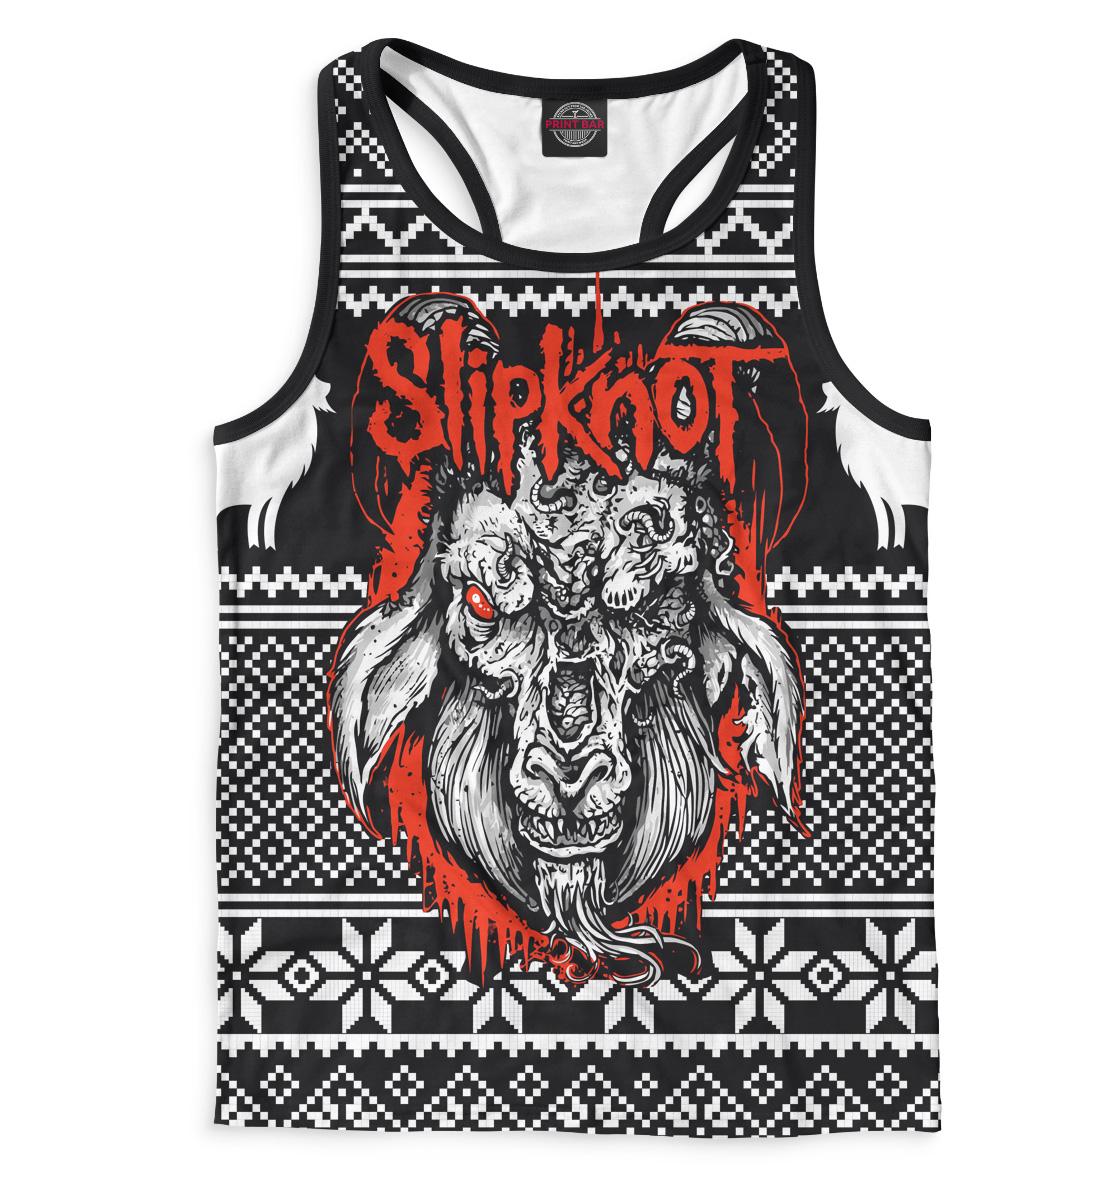 Slipknot, Printbar, Майки борцовки, SLI-546767-mayb-2  - купить со скидкой